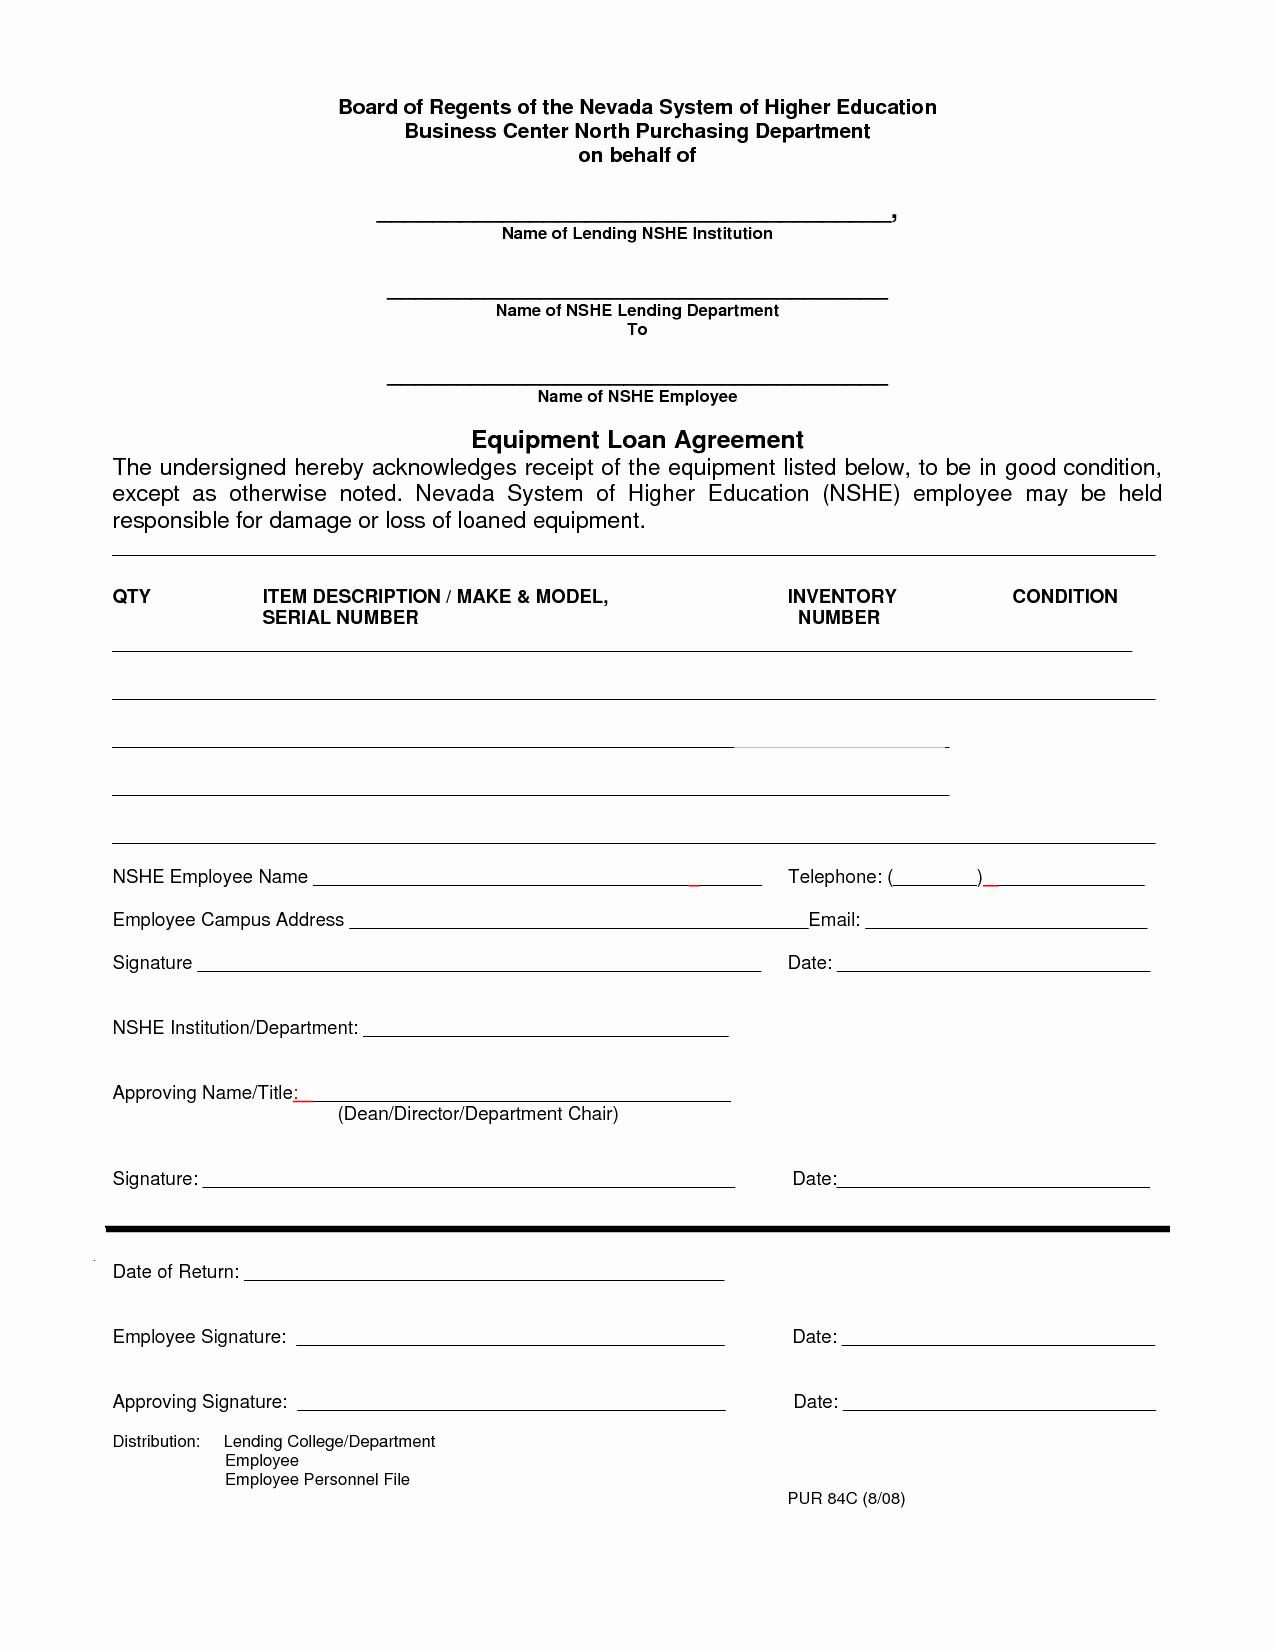 Equipment Loan Agreement Template Beautiful 10 Best Of Employee Loan Agreement Employee Loan